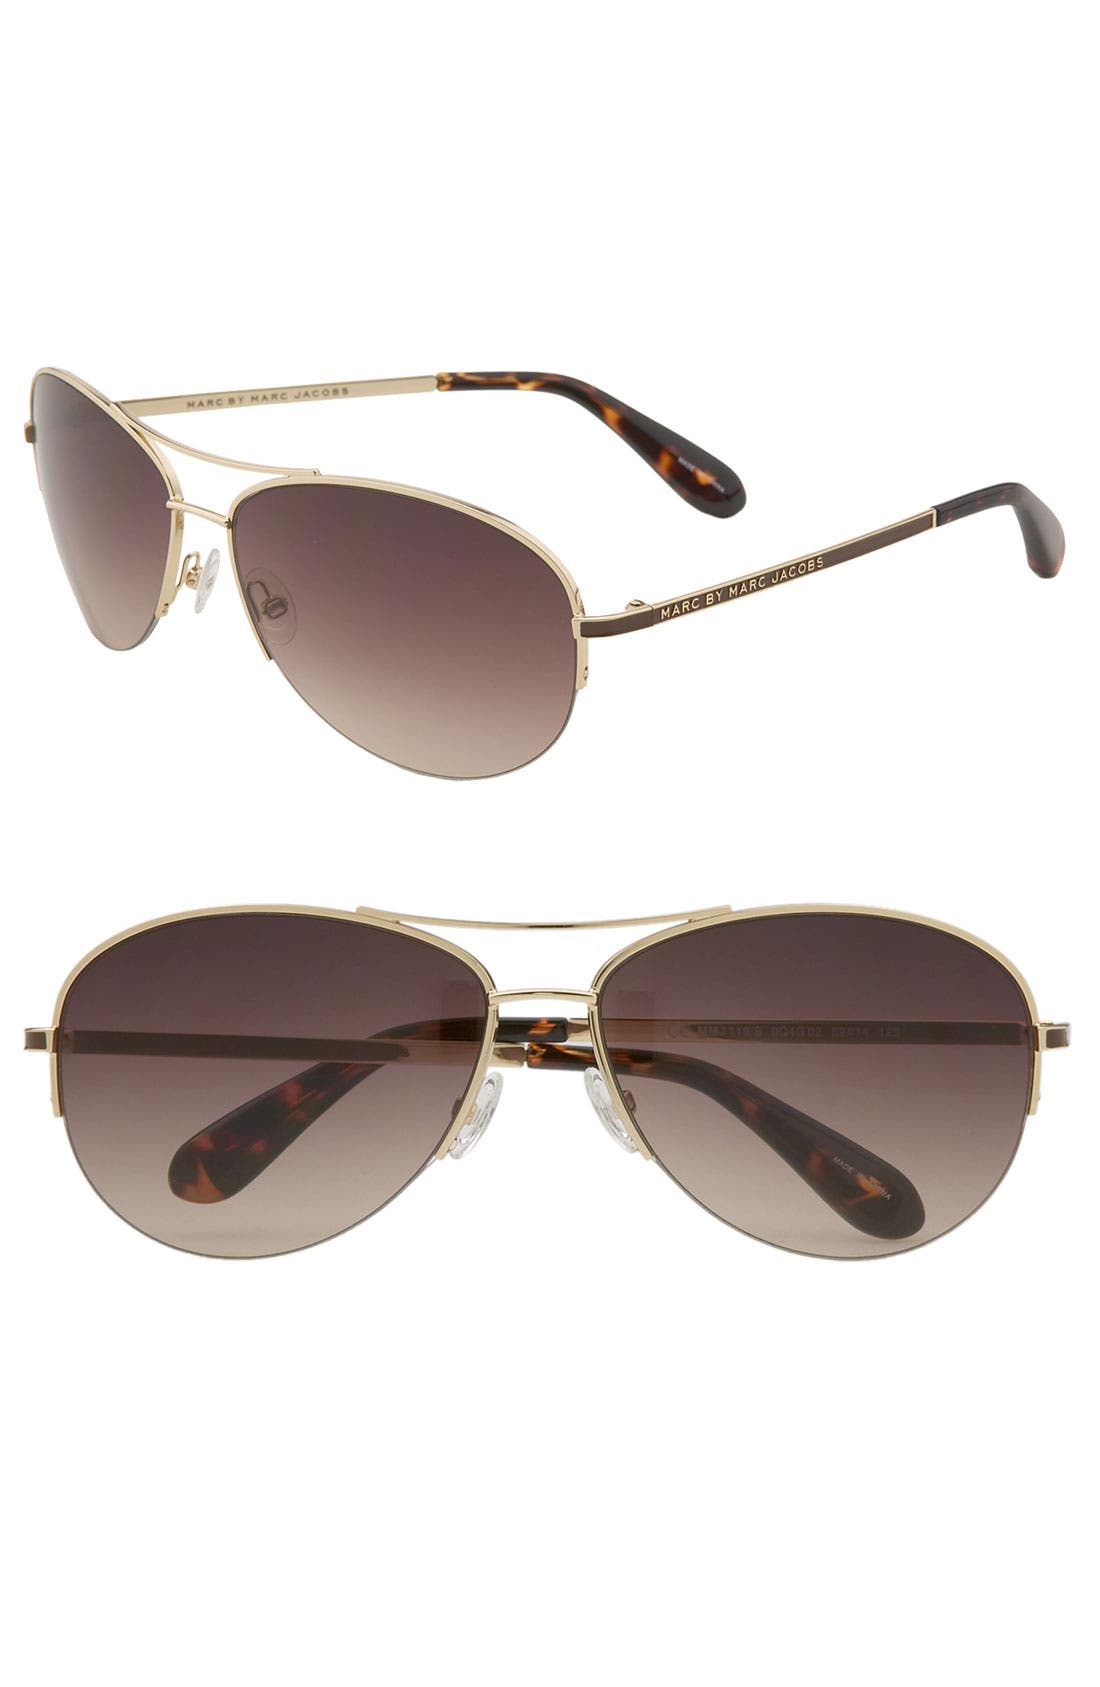 59mm Rimless Aviator Sunglasses,                         Main,                         color, Brown Tortoise